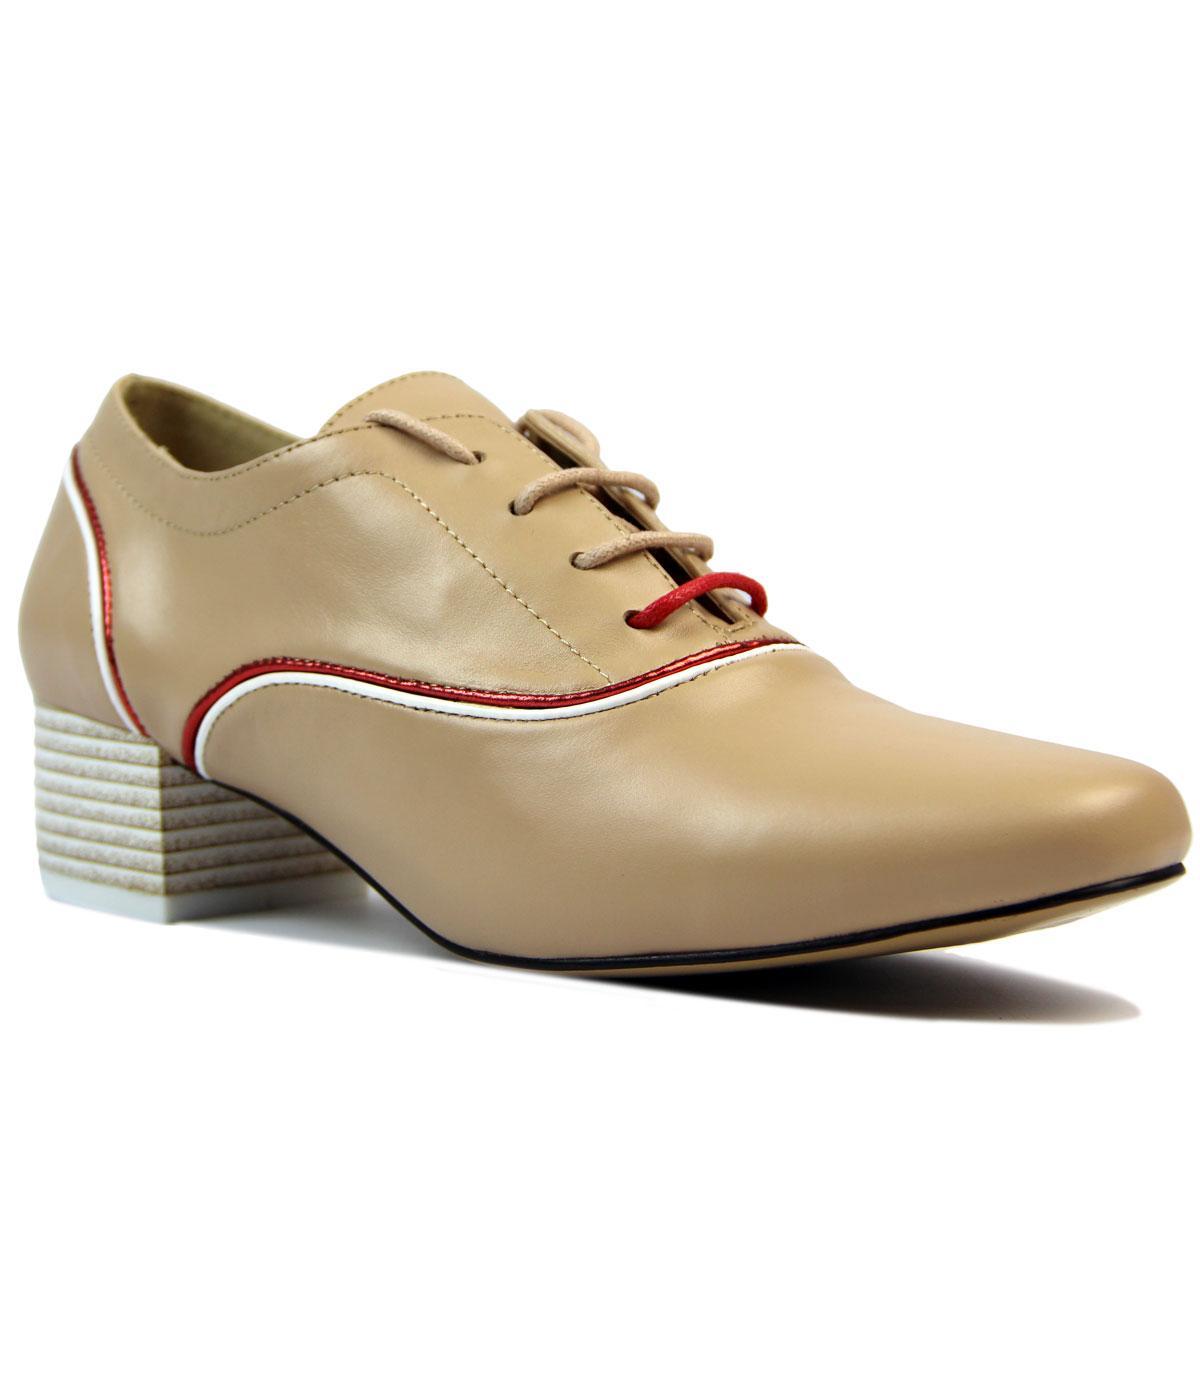 Patti LACEYS Retro Mod Piping Trim Patent Shoes N